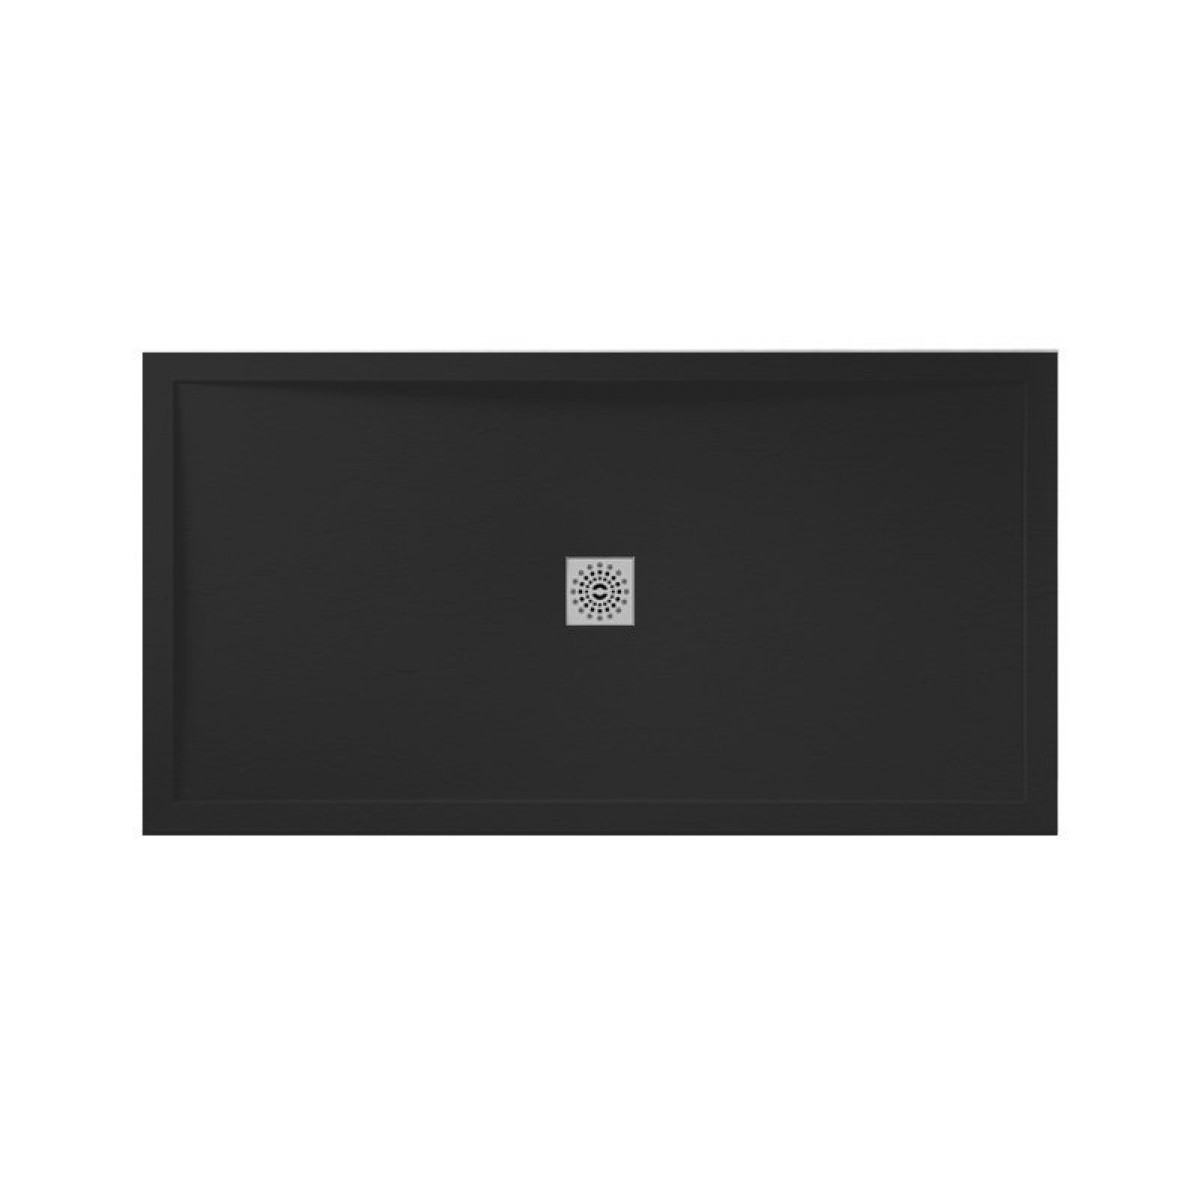 April Waifer Slate Effect Black 1200 x 700mm Shower Tray | 557/999 -